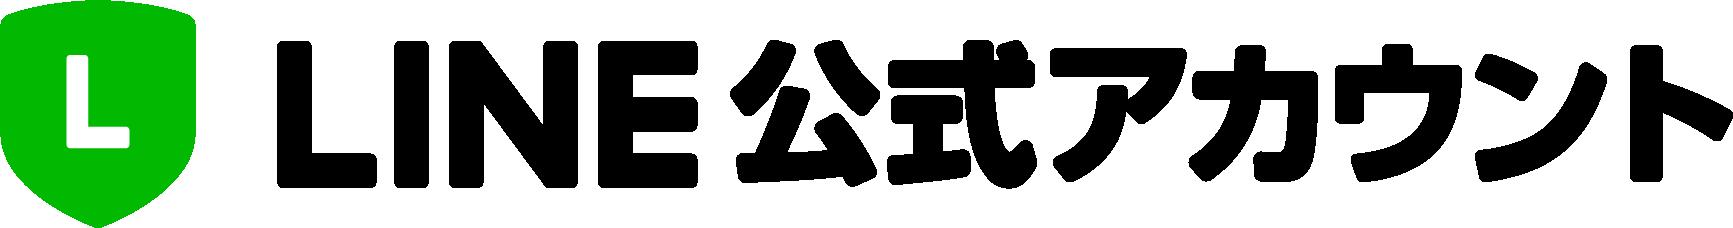 /stf/linecorp/ja/pr/LOA_logo.png